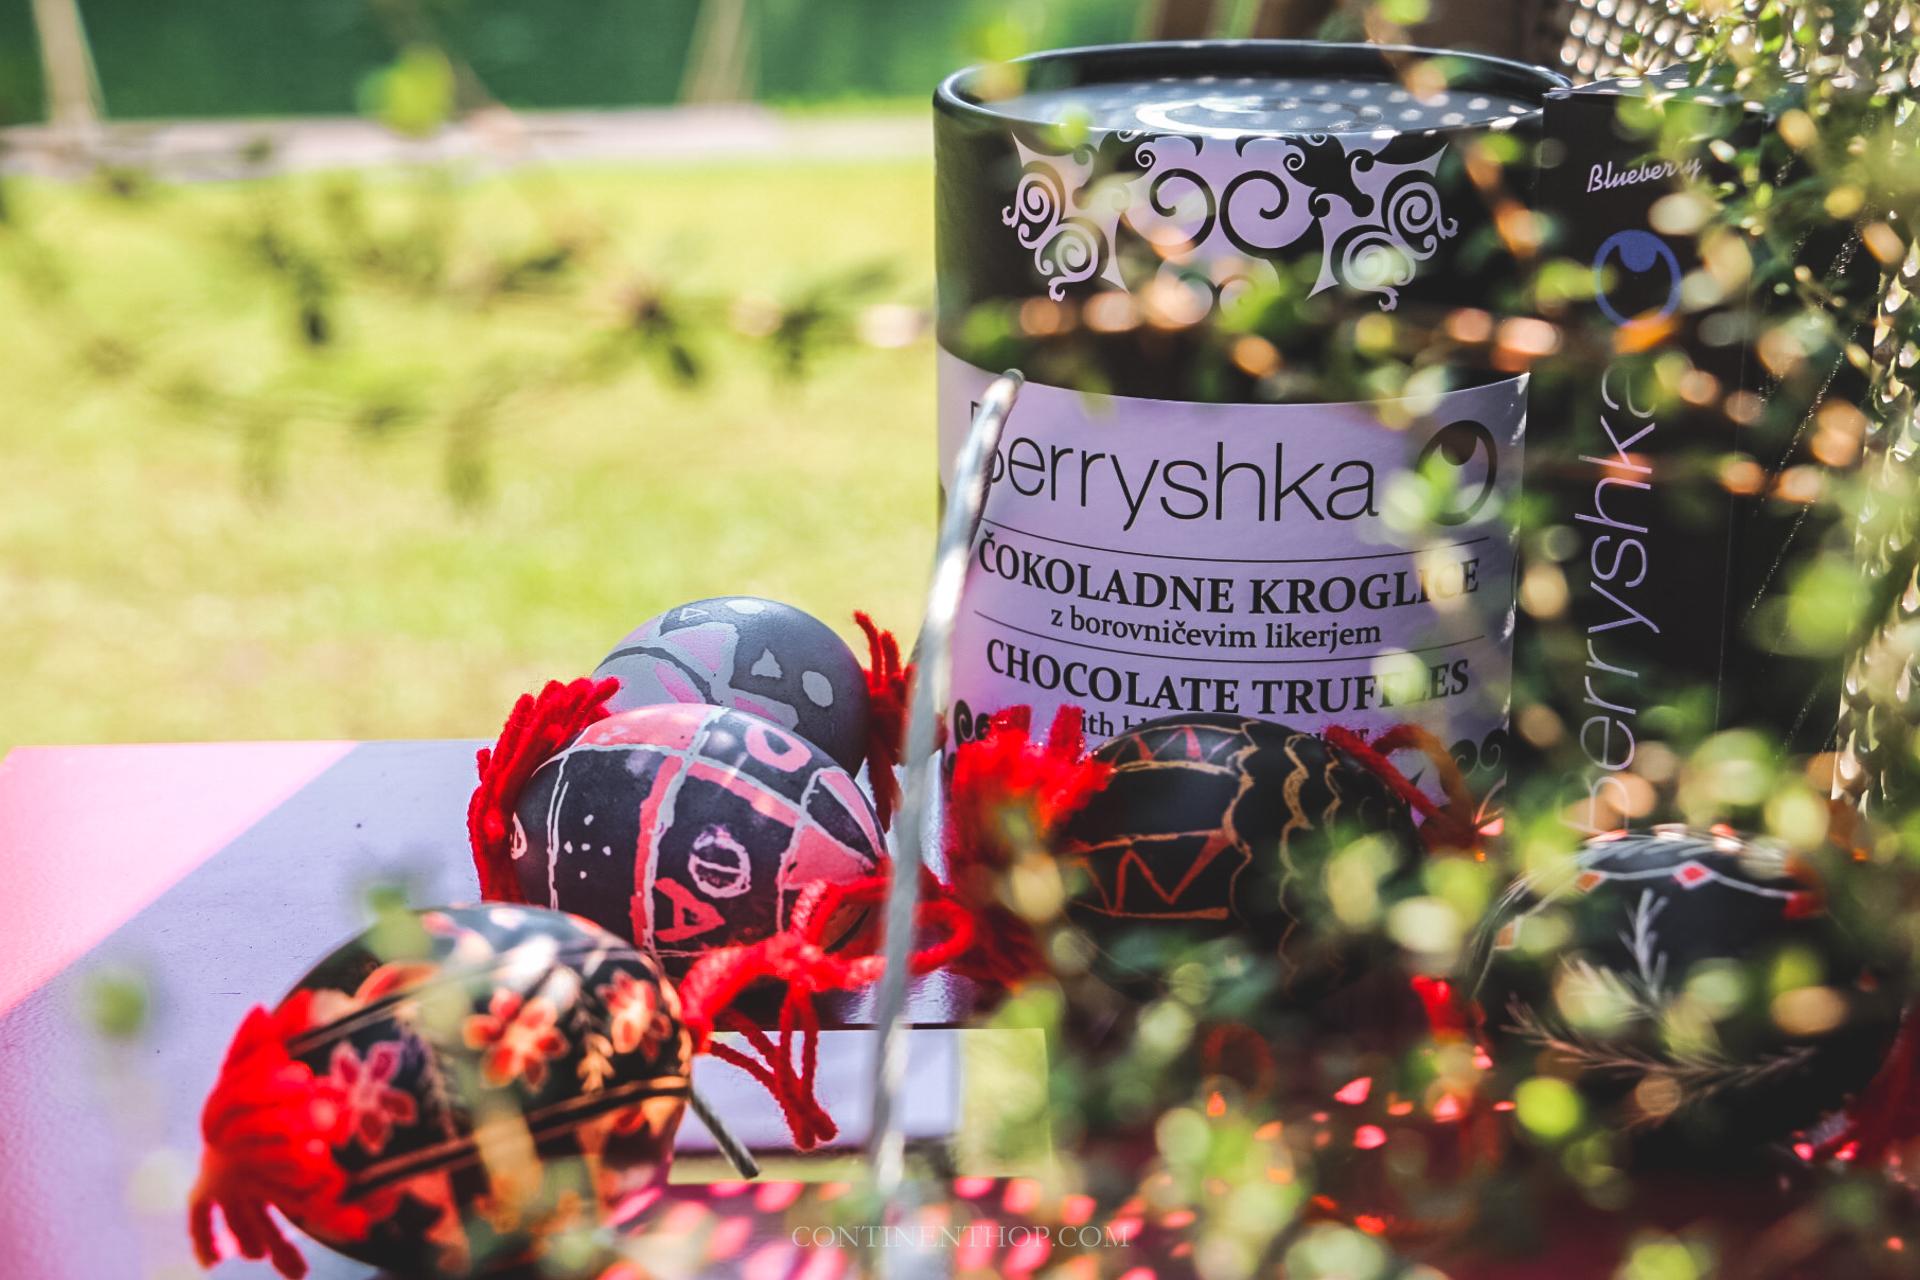 chocolates at big berry luxury glamping resort in bela krajina slovenia